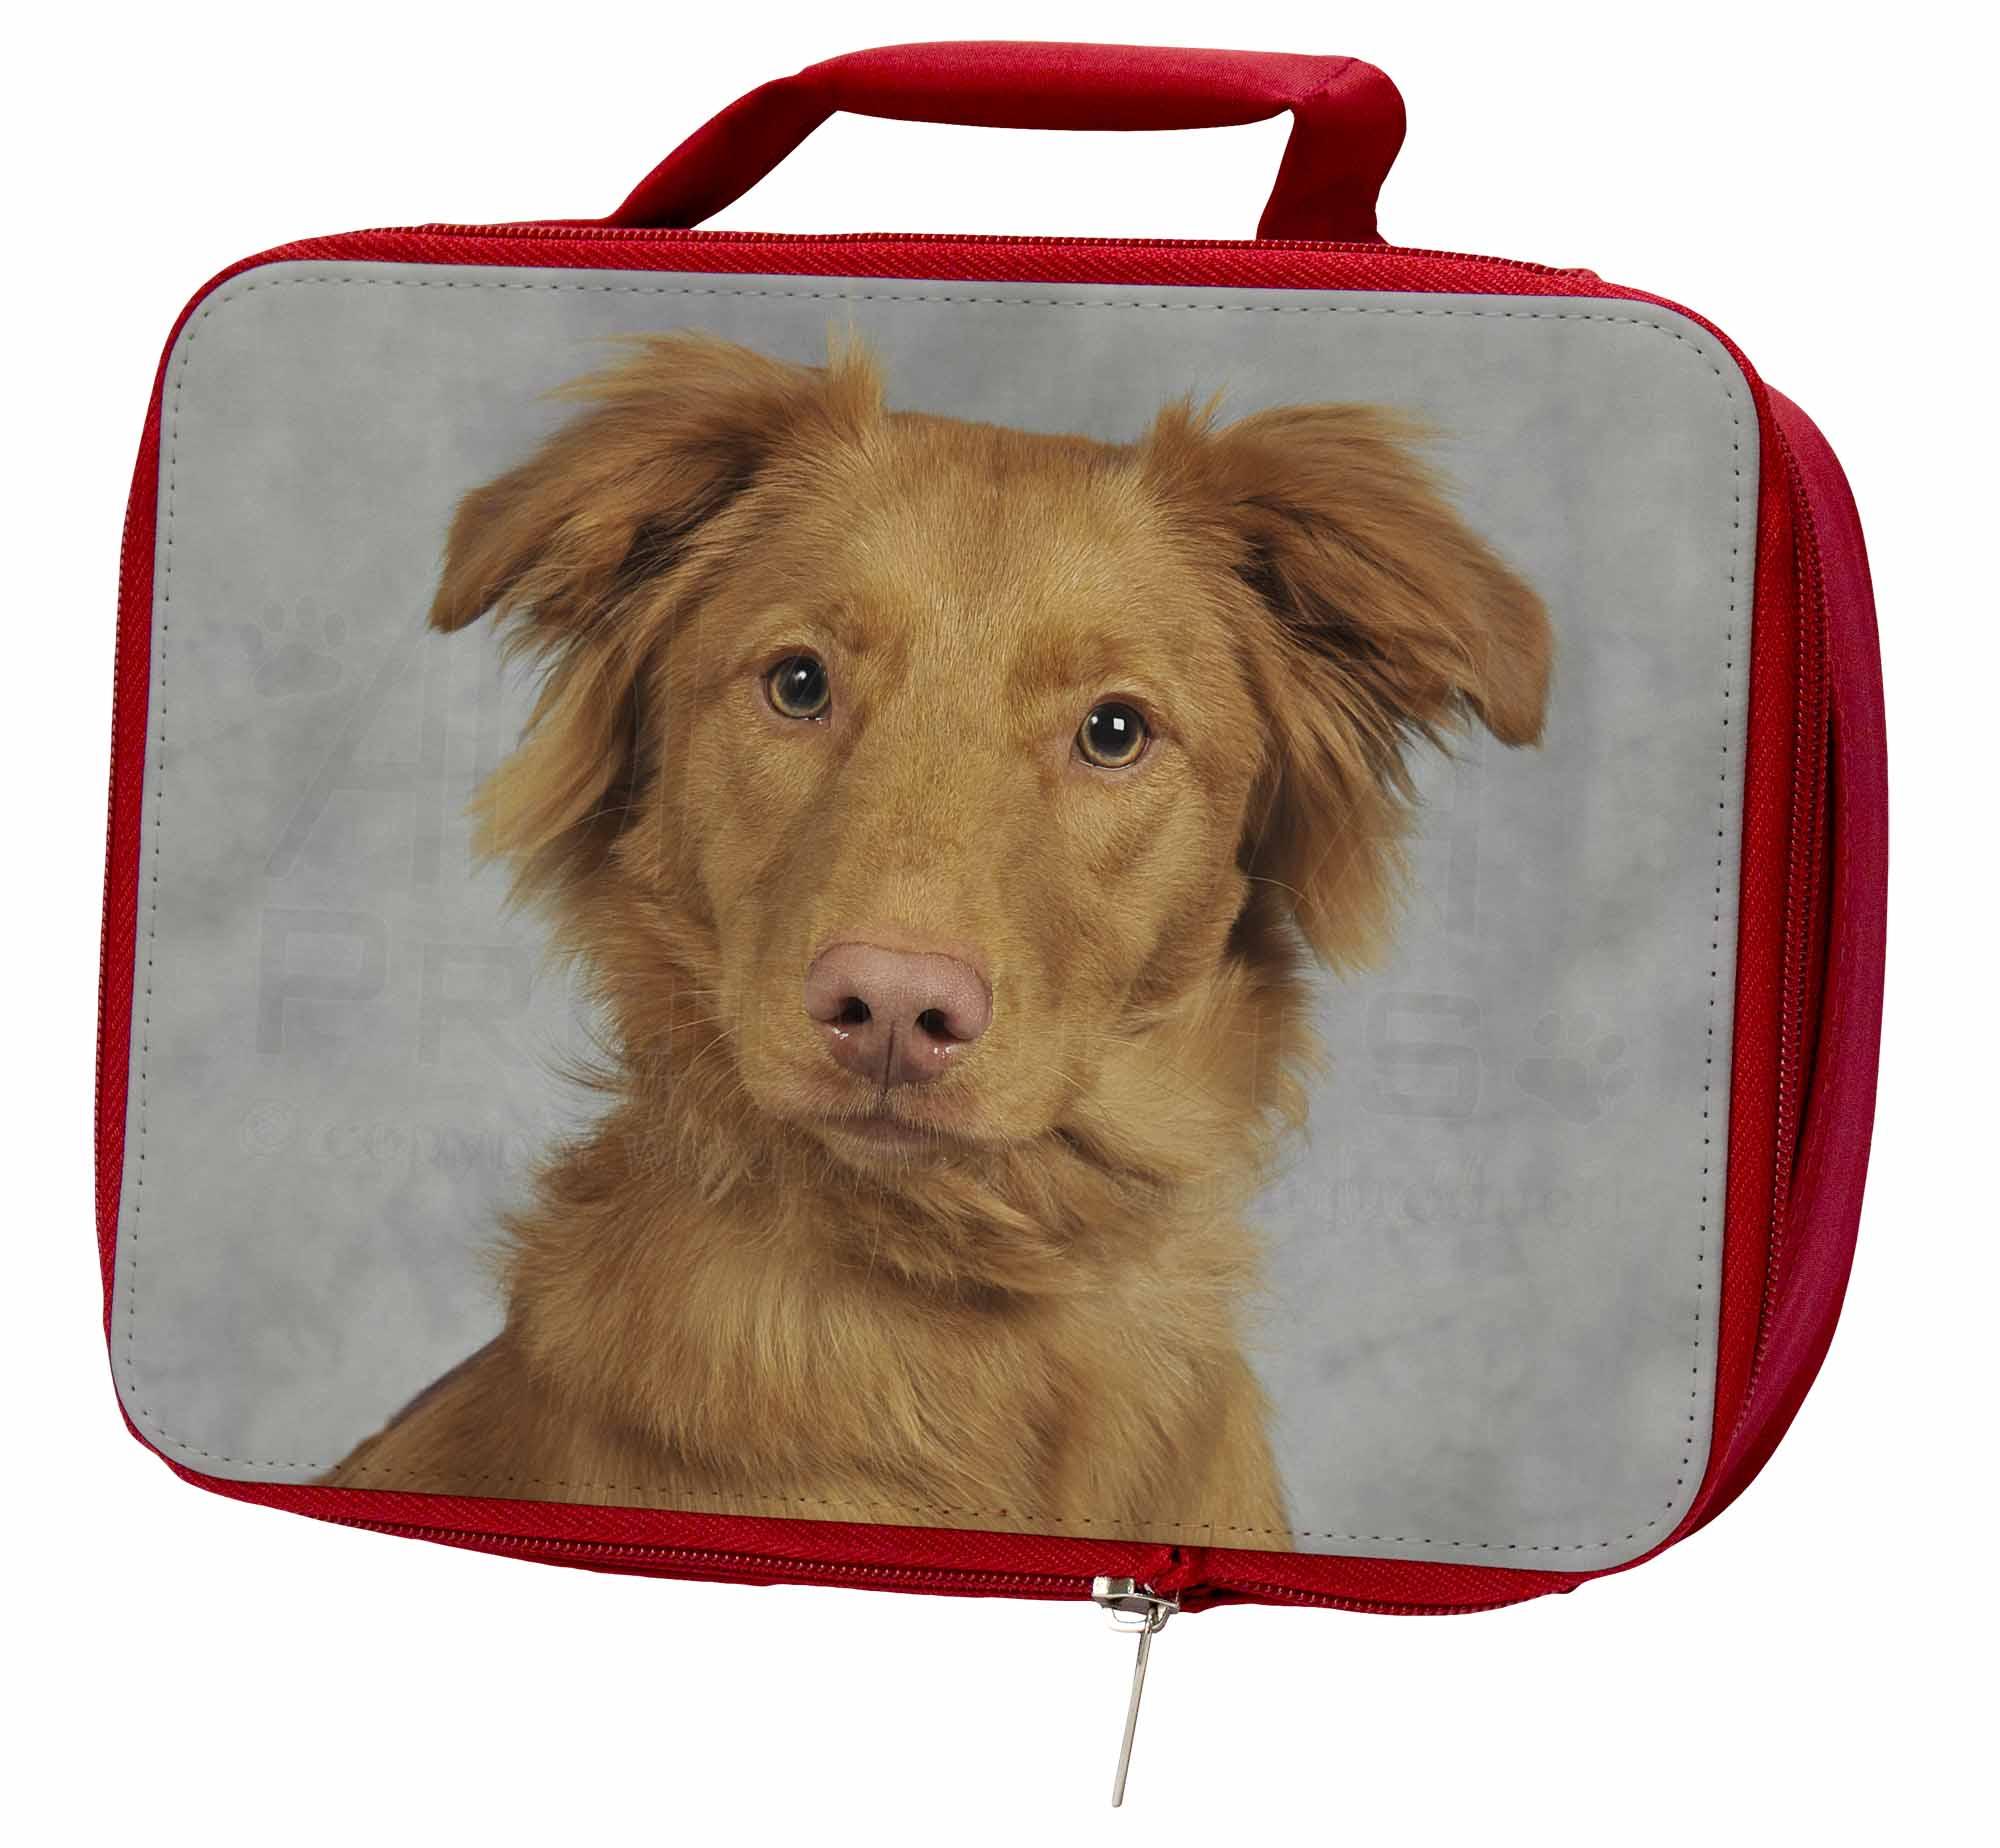 Nova Box/Picnic Scotia Duck Retriever Insulated Red School Lunch Box/Picnic Nova Bag, AD-RN2LBR 23ae3e